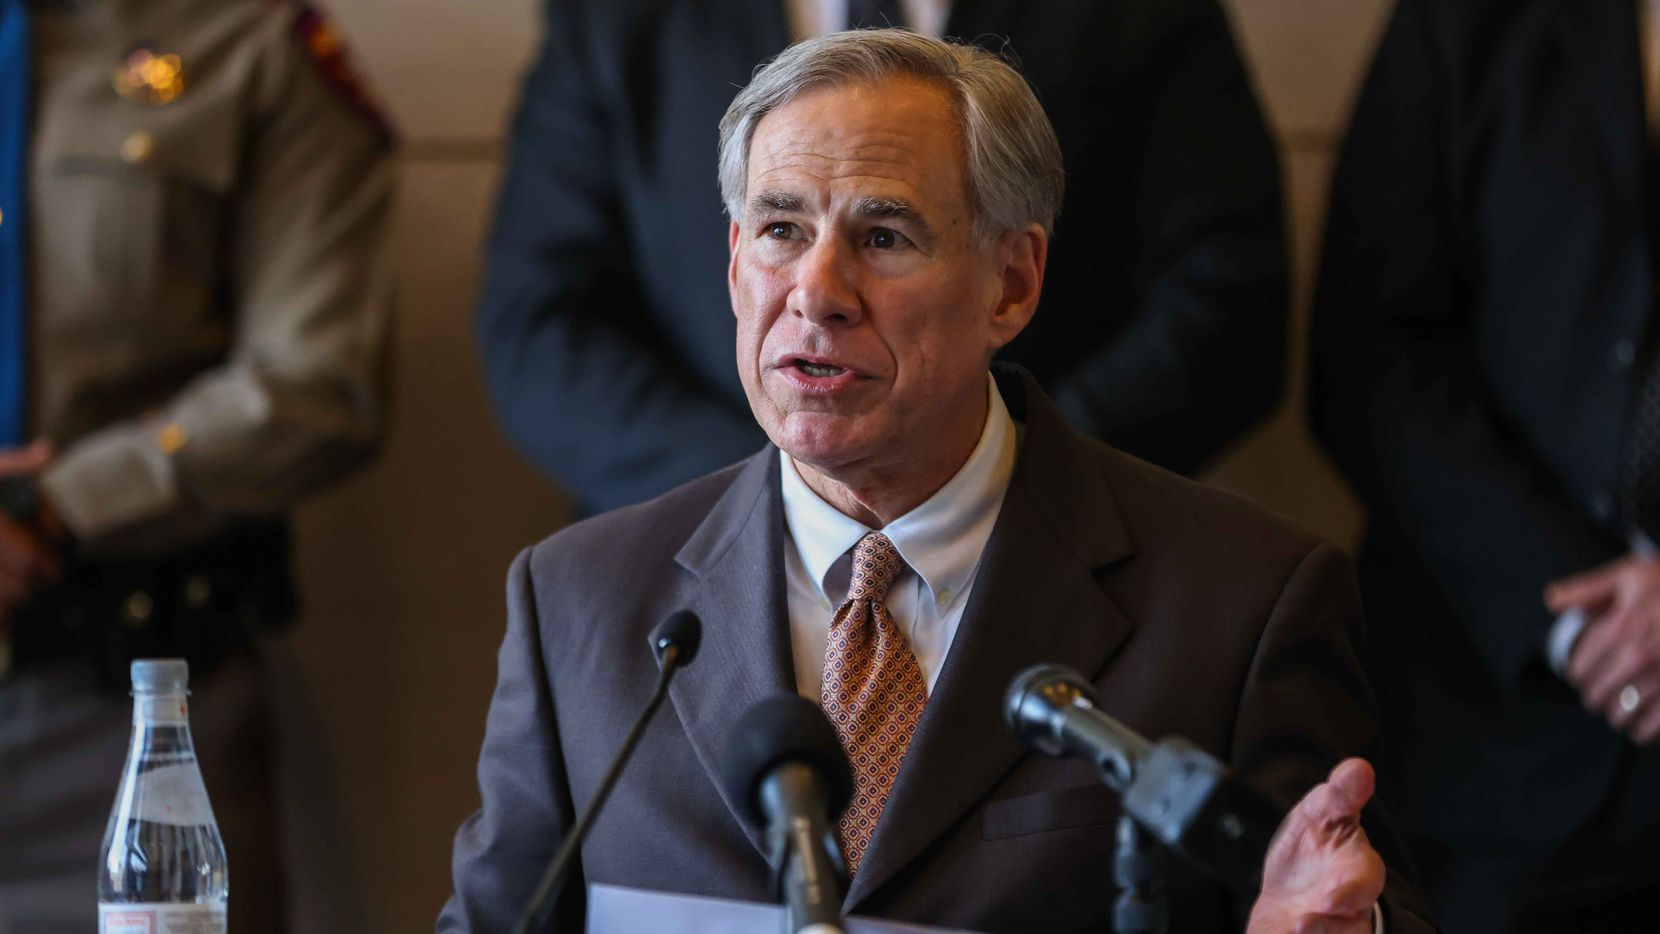 Gov. Greg Abbott during a press conference in Dallas, March 17, 2021.